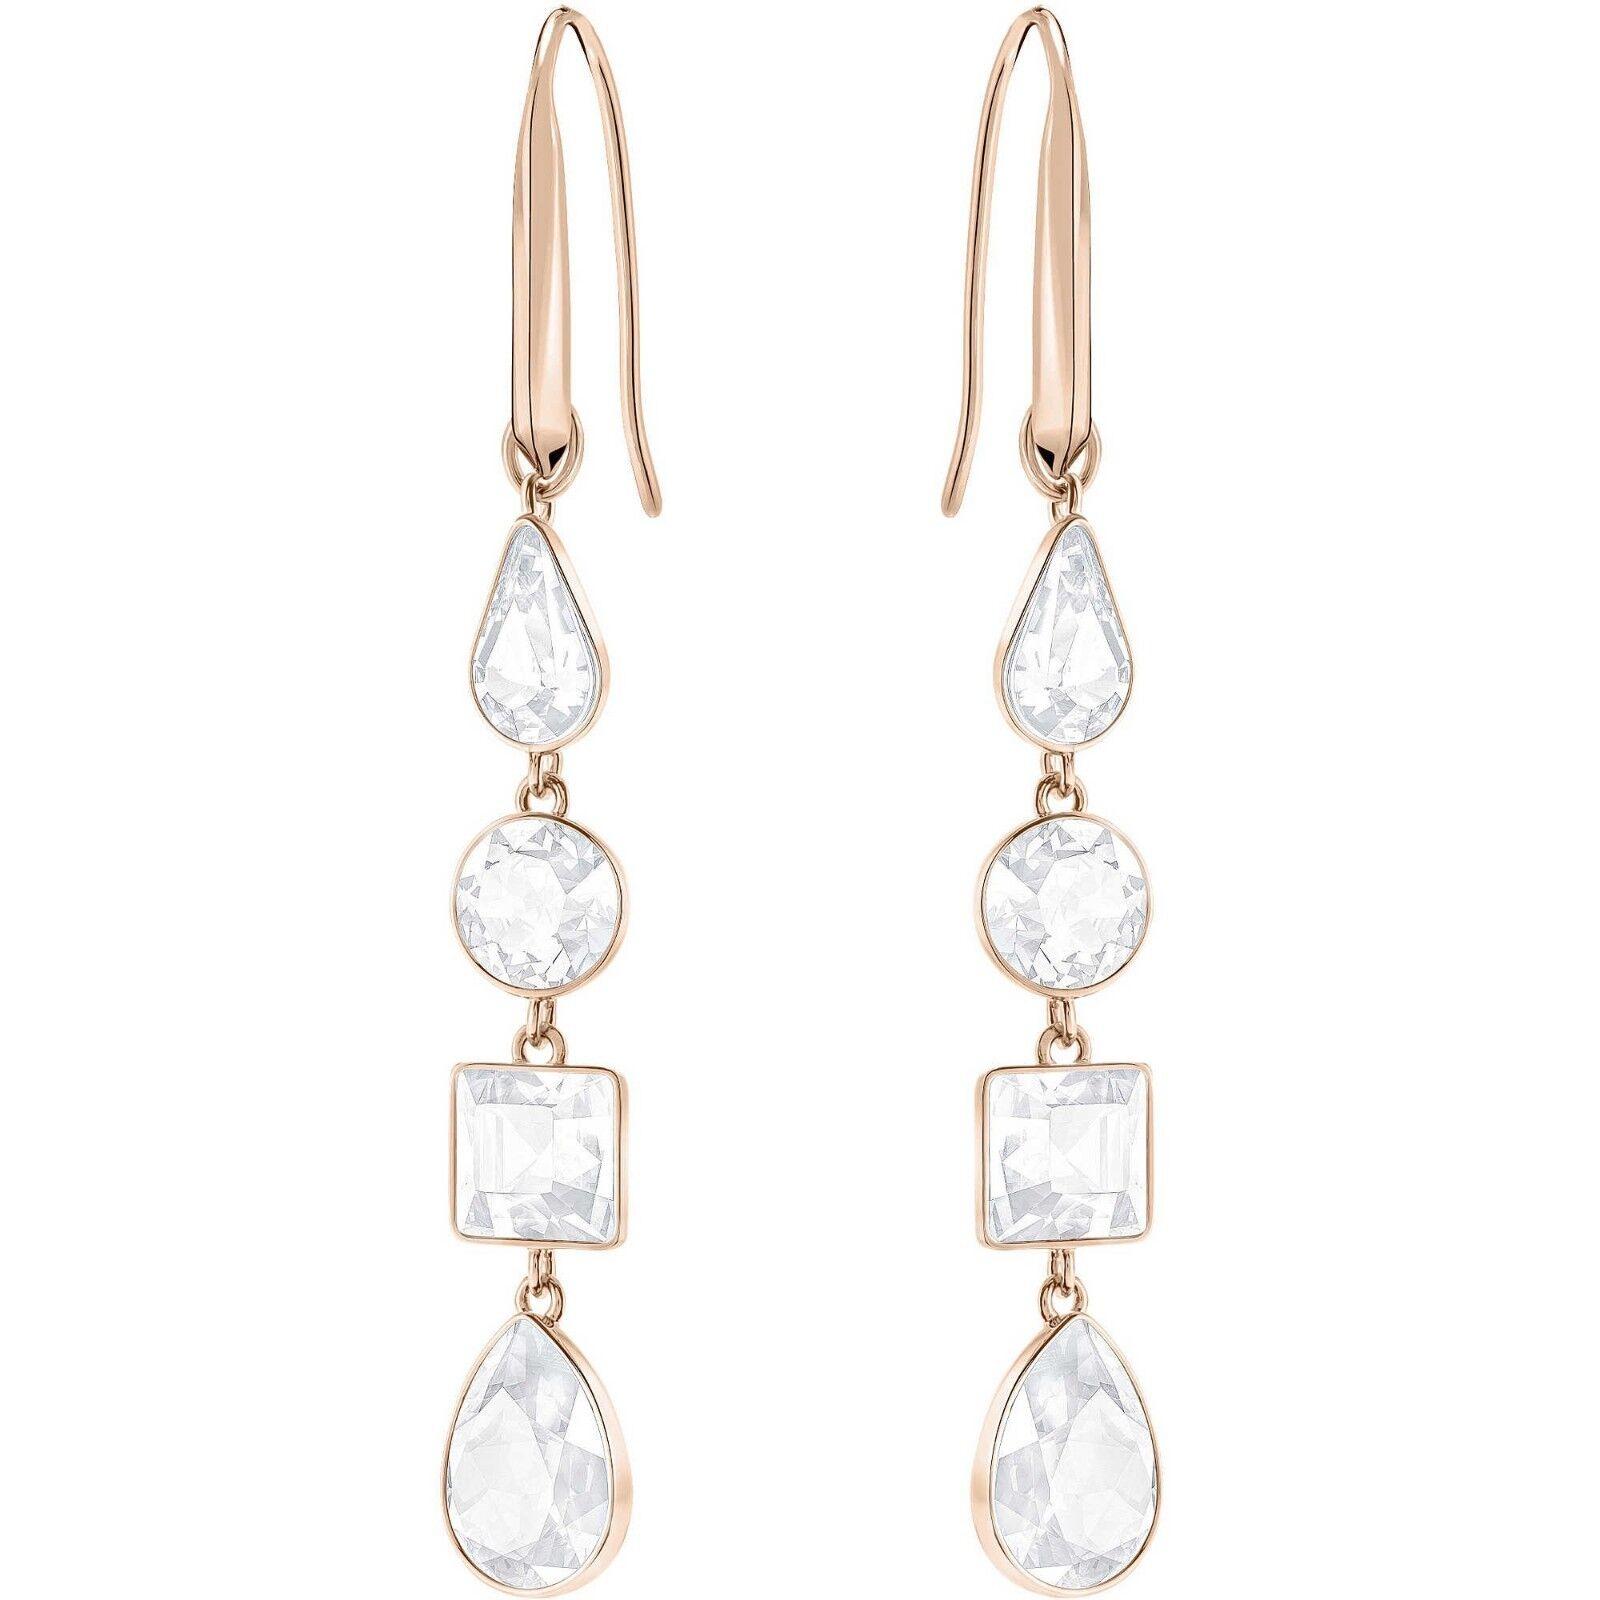 SWAROVSKI 5395236 White Lisanne Pierced Earrings NIB Authentic